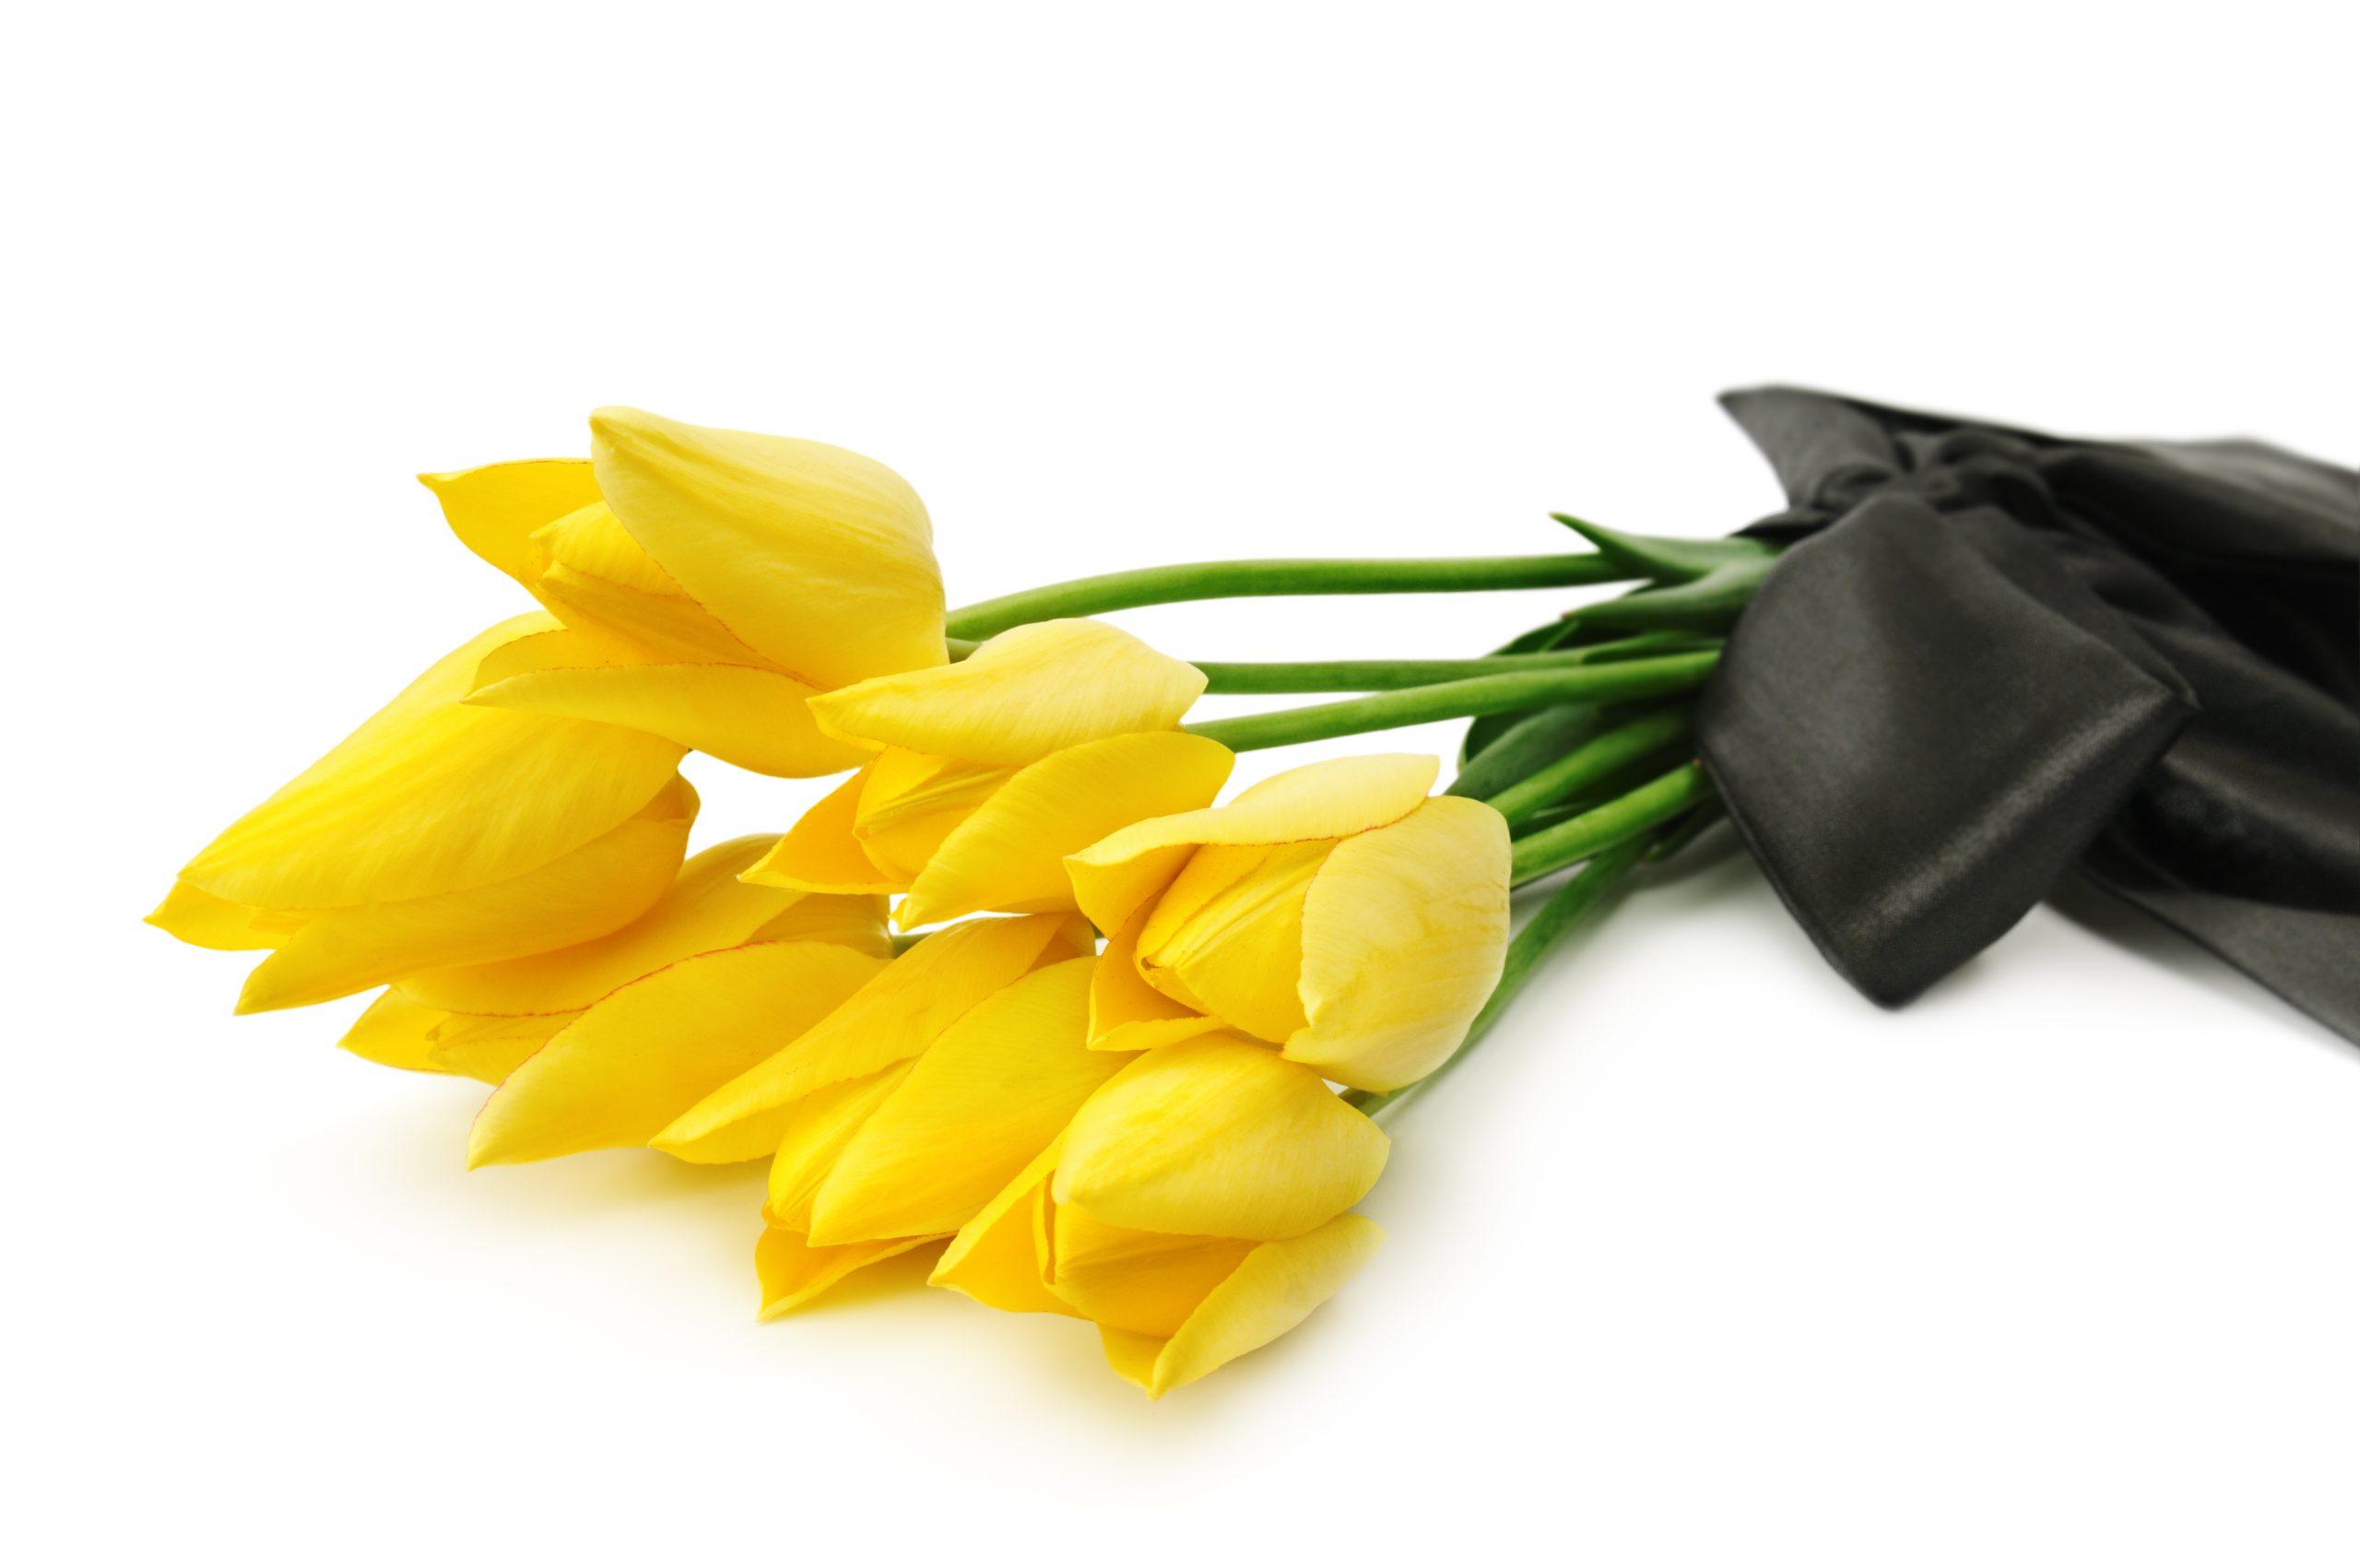 цветы фото траур желтые фенечку любой